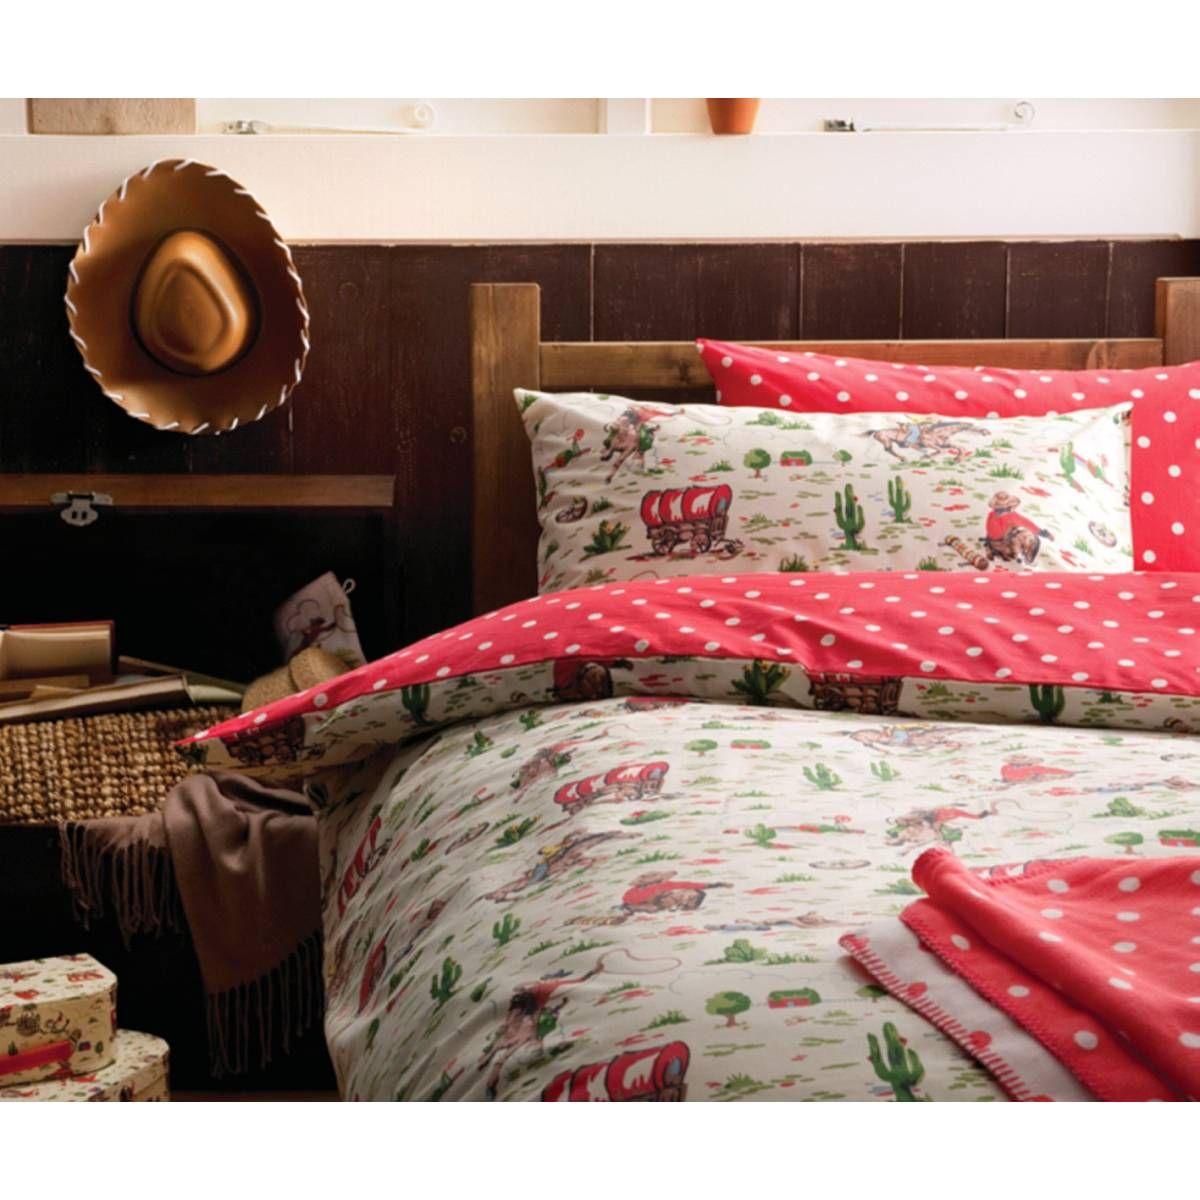 Cath Kidston Cowboy Bedding Set Childrens Bedroom